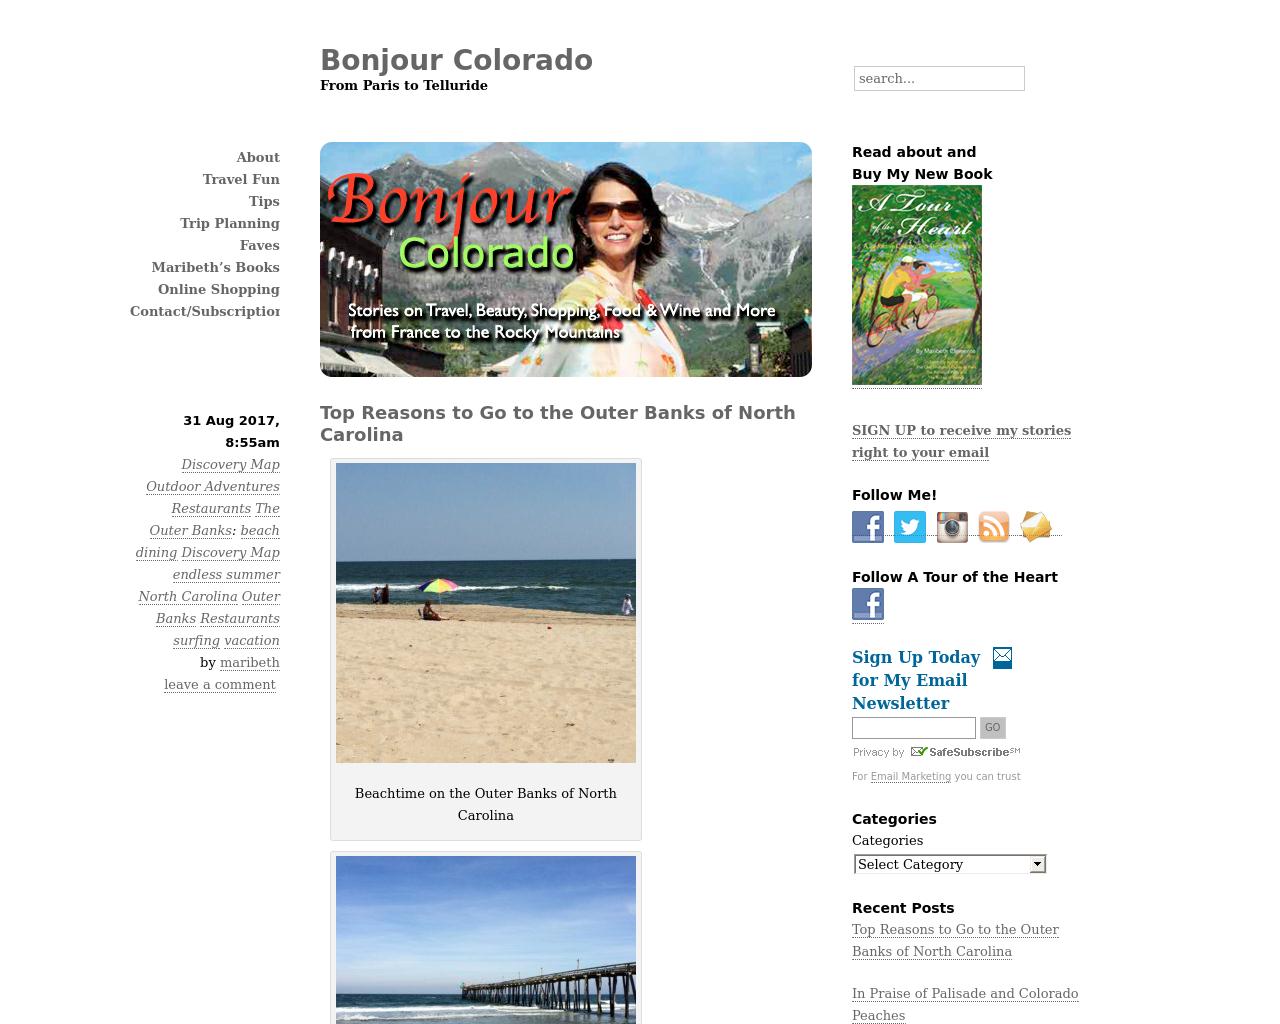 Bonjour-Colorado-Advertising-Reviews-Pricing